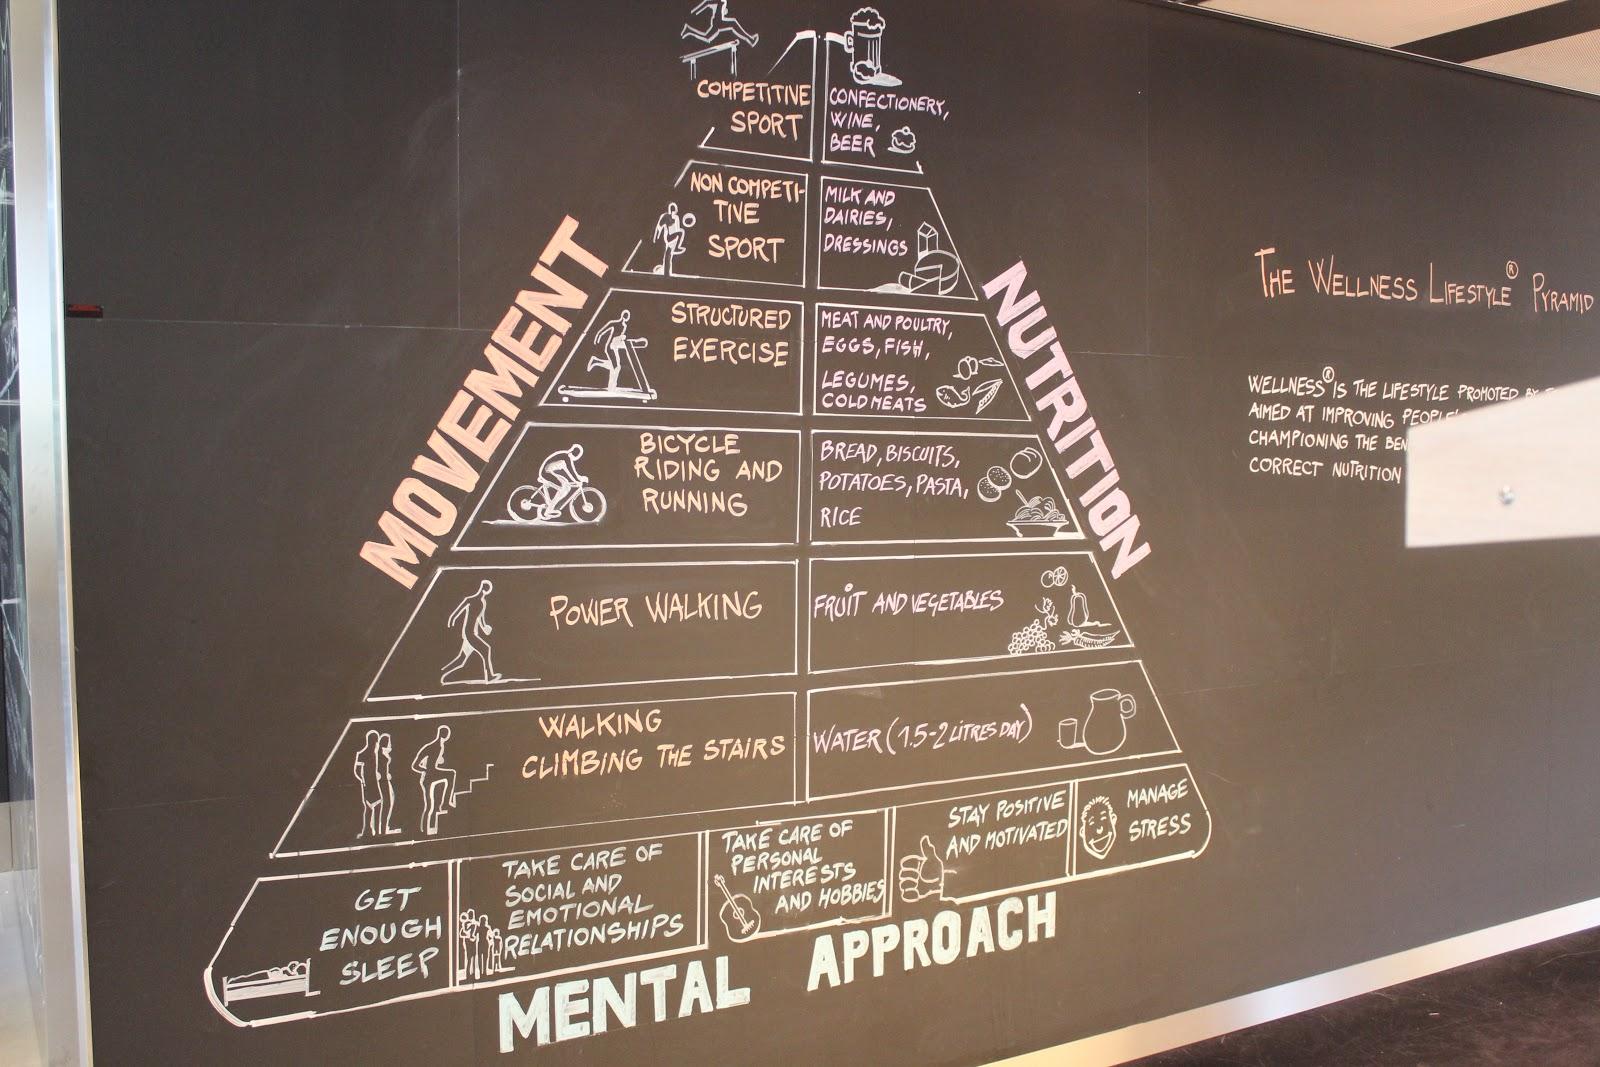 technogym lifestyle pyramid